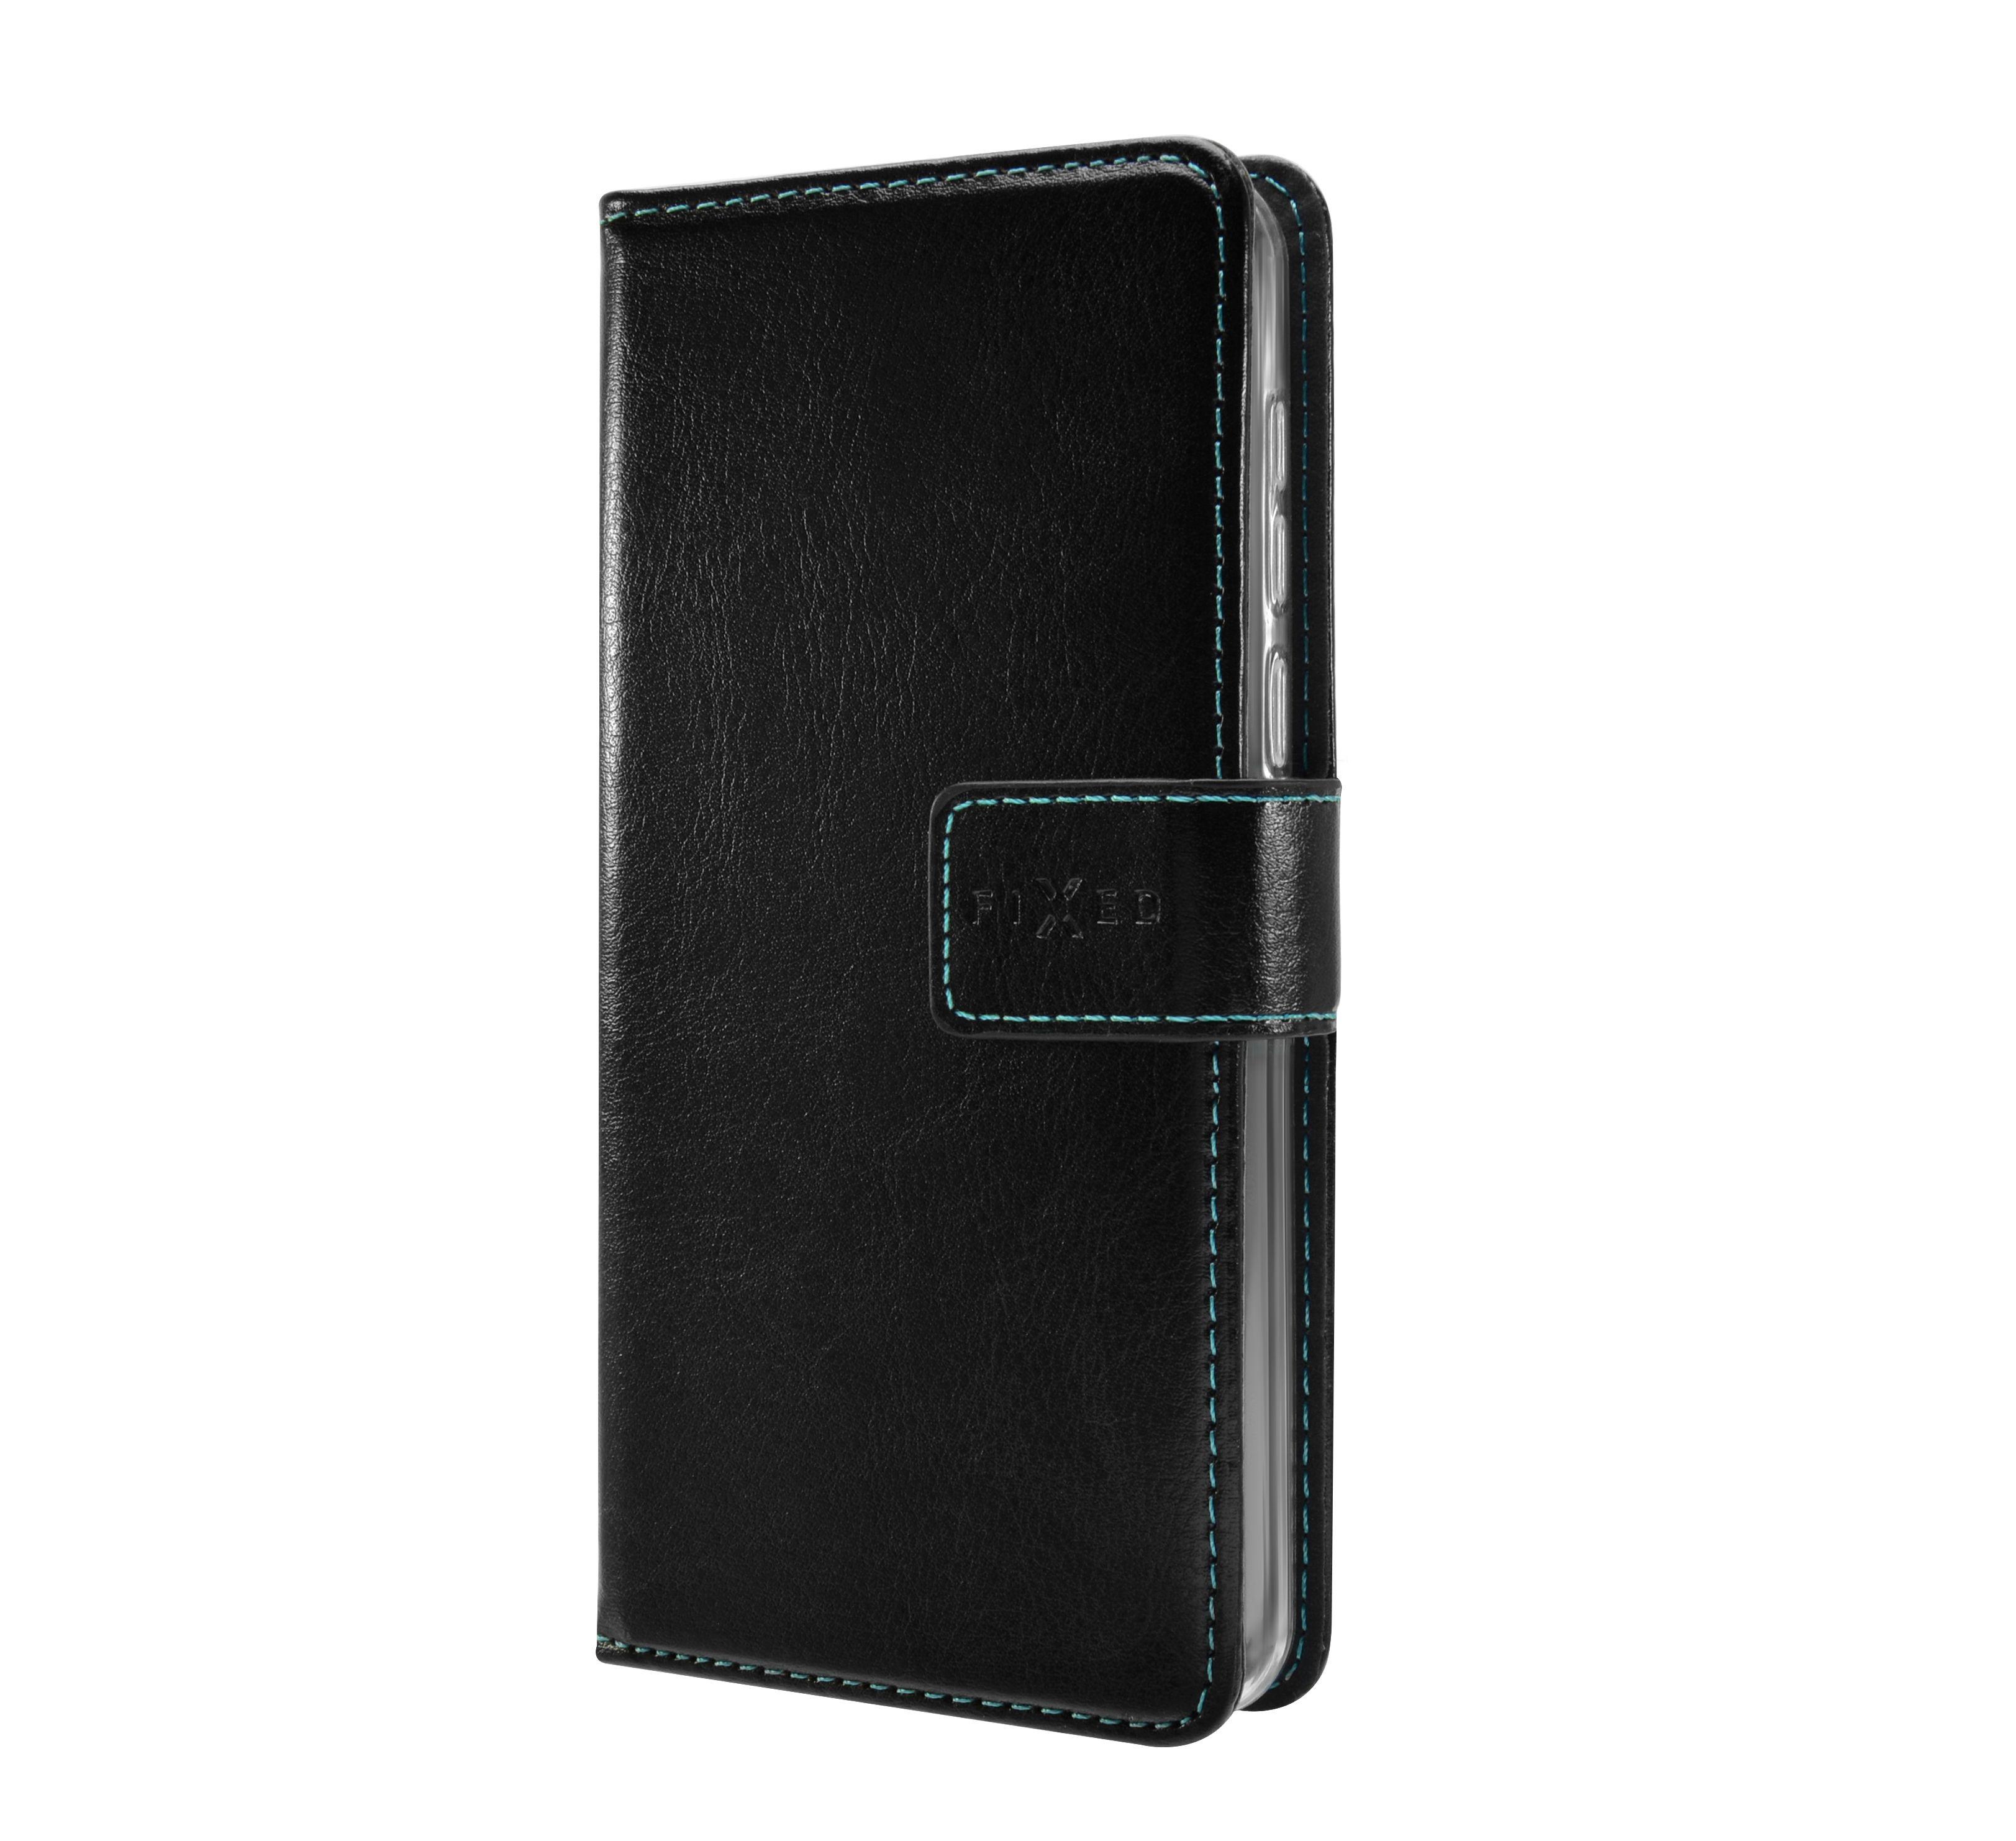 Pouzdro typu kniha FIXED Opus pro Sony Xperia 1, černé